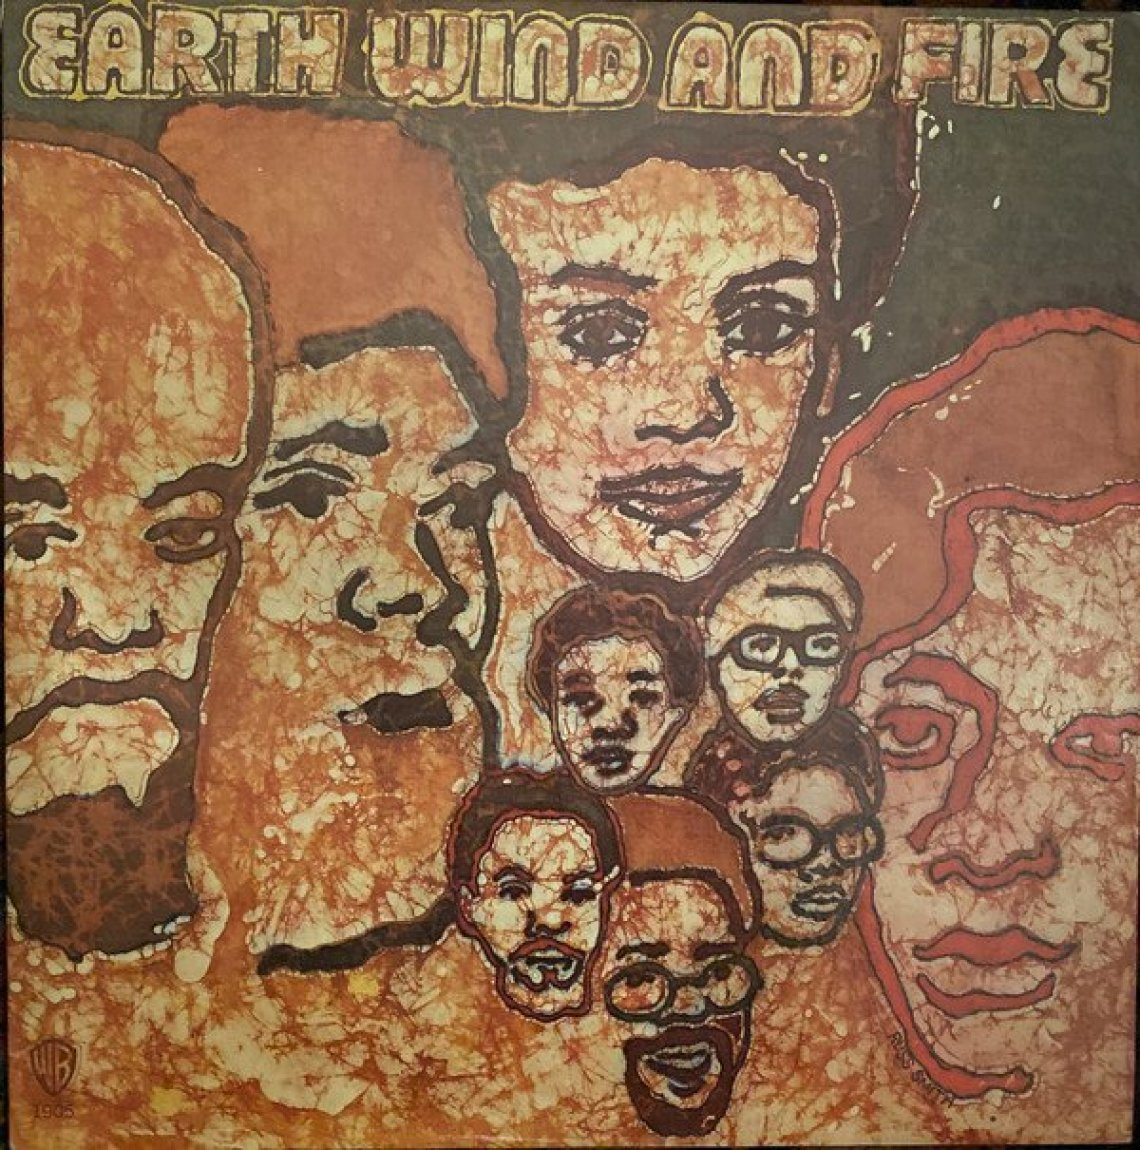 Earth, Wind & Fire - The Legend Slot - Female Original